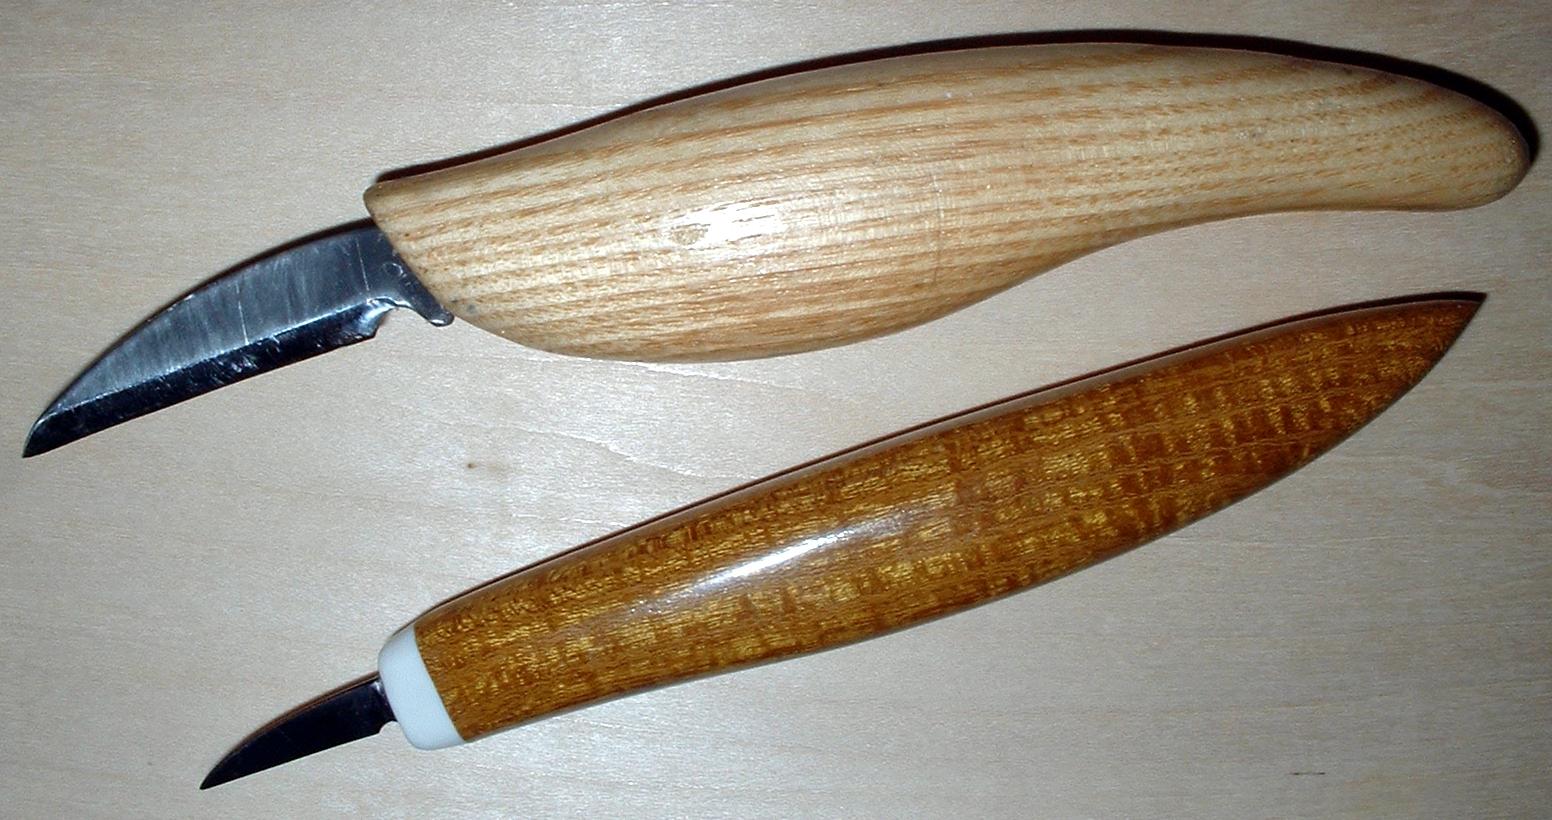 Kiltesteresanati ahşap oyma bıçakları